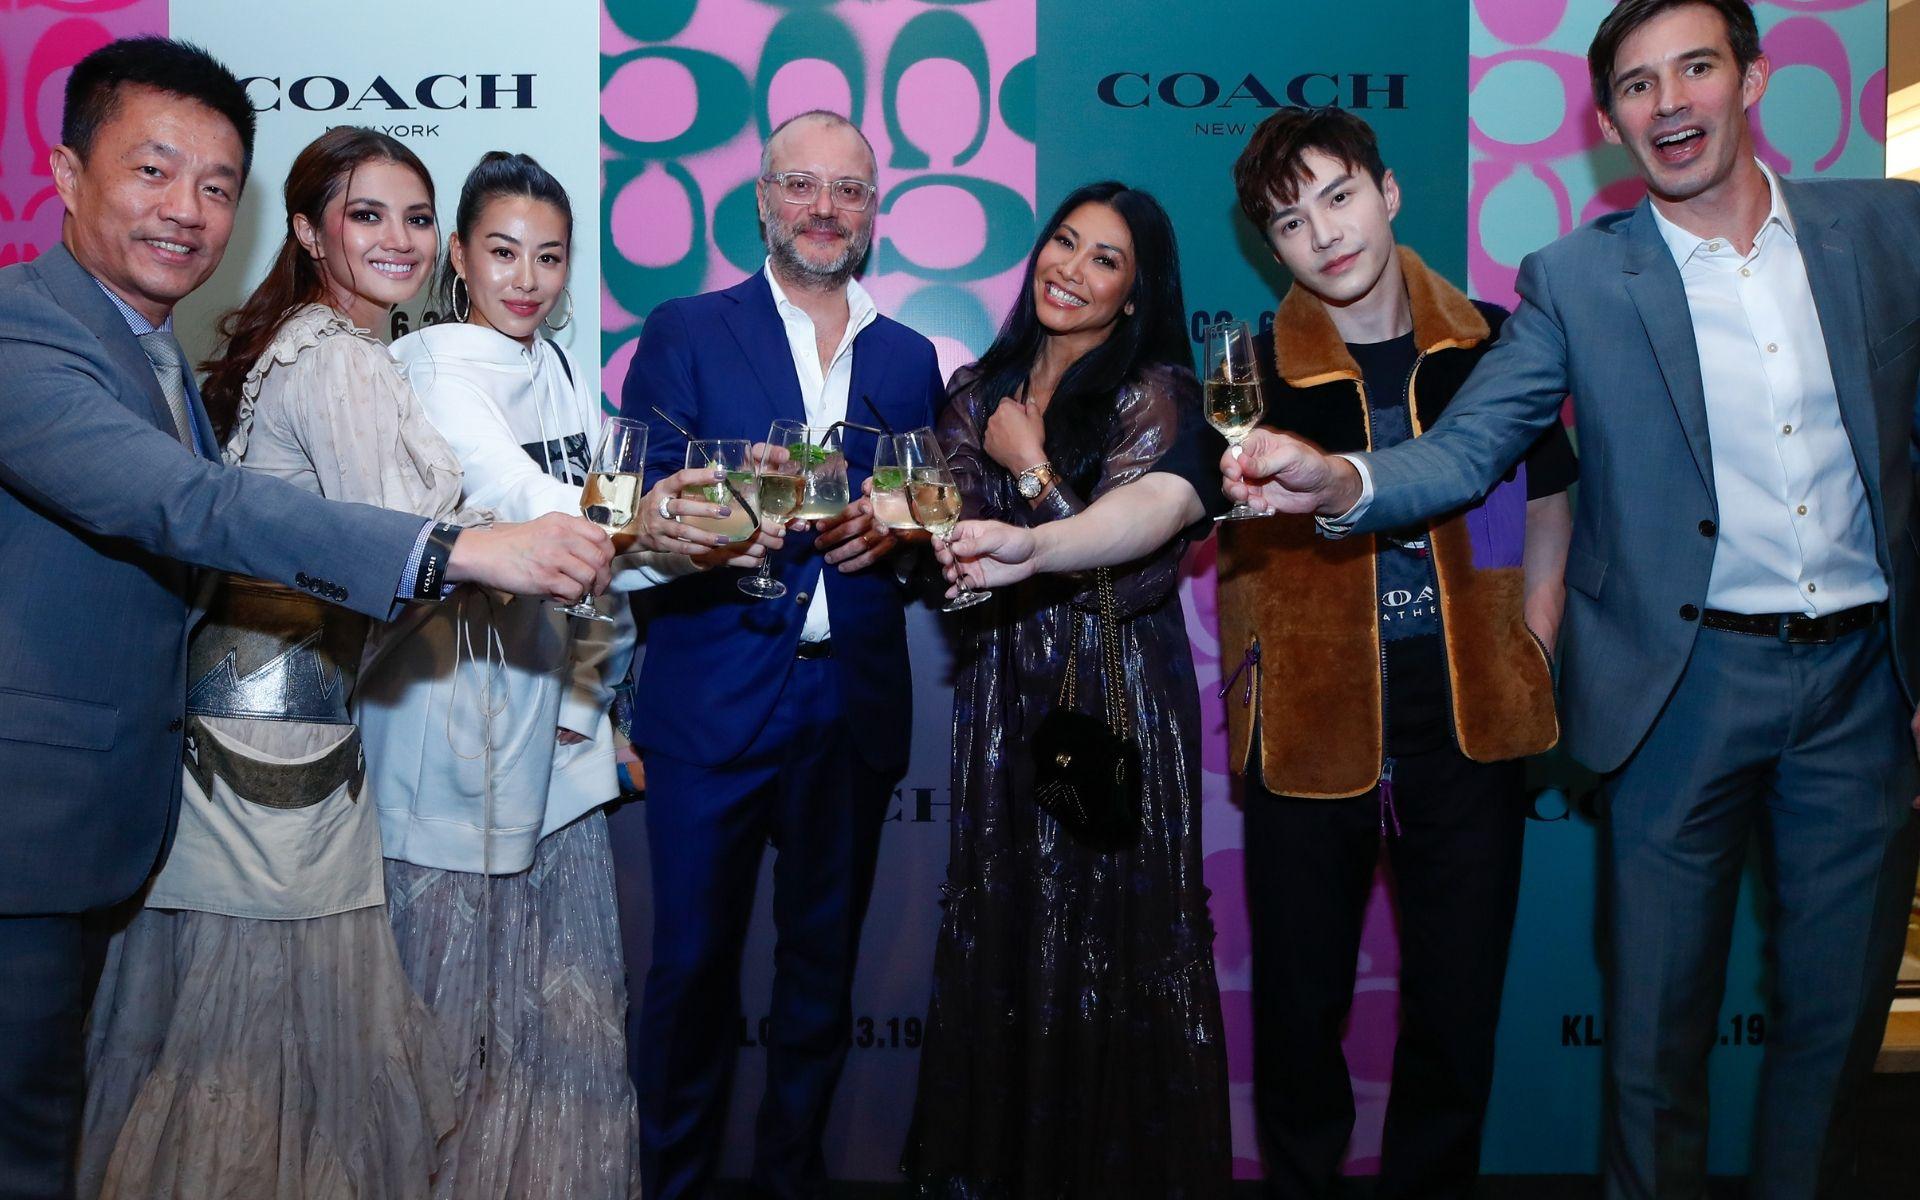 (From left) Francis Tan, Nur Fazura, Dizzy Dizzo, Giorgio Sarne, Anggun, Lawrence Wong and Emmanuel Ruelland